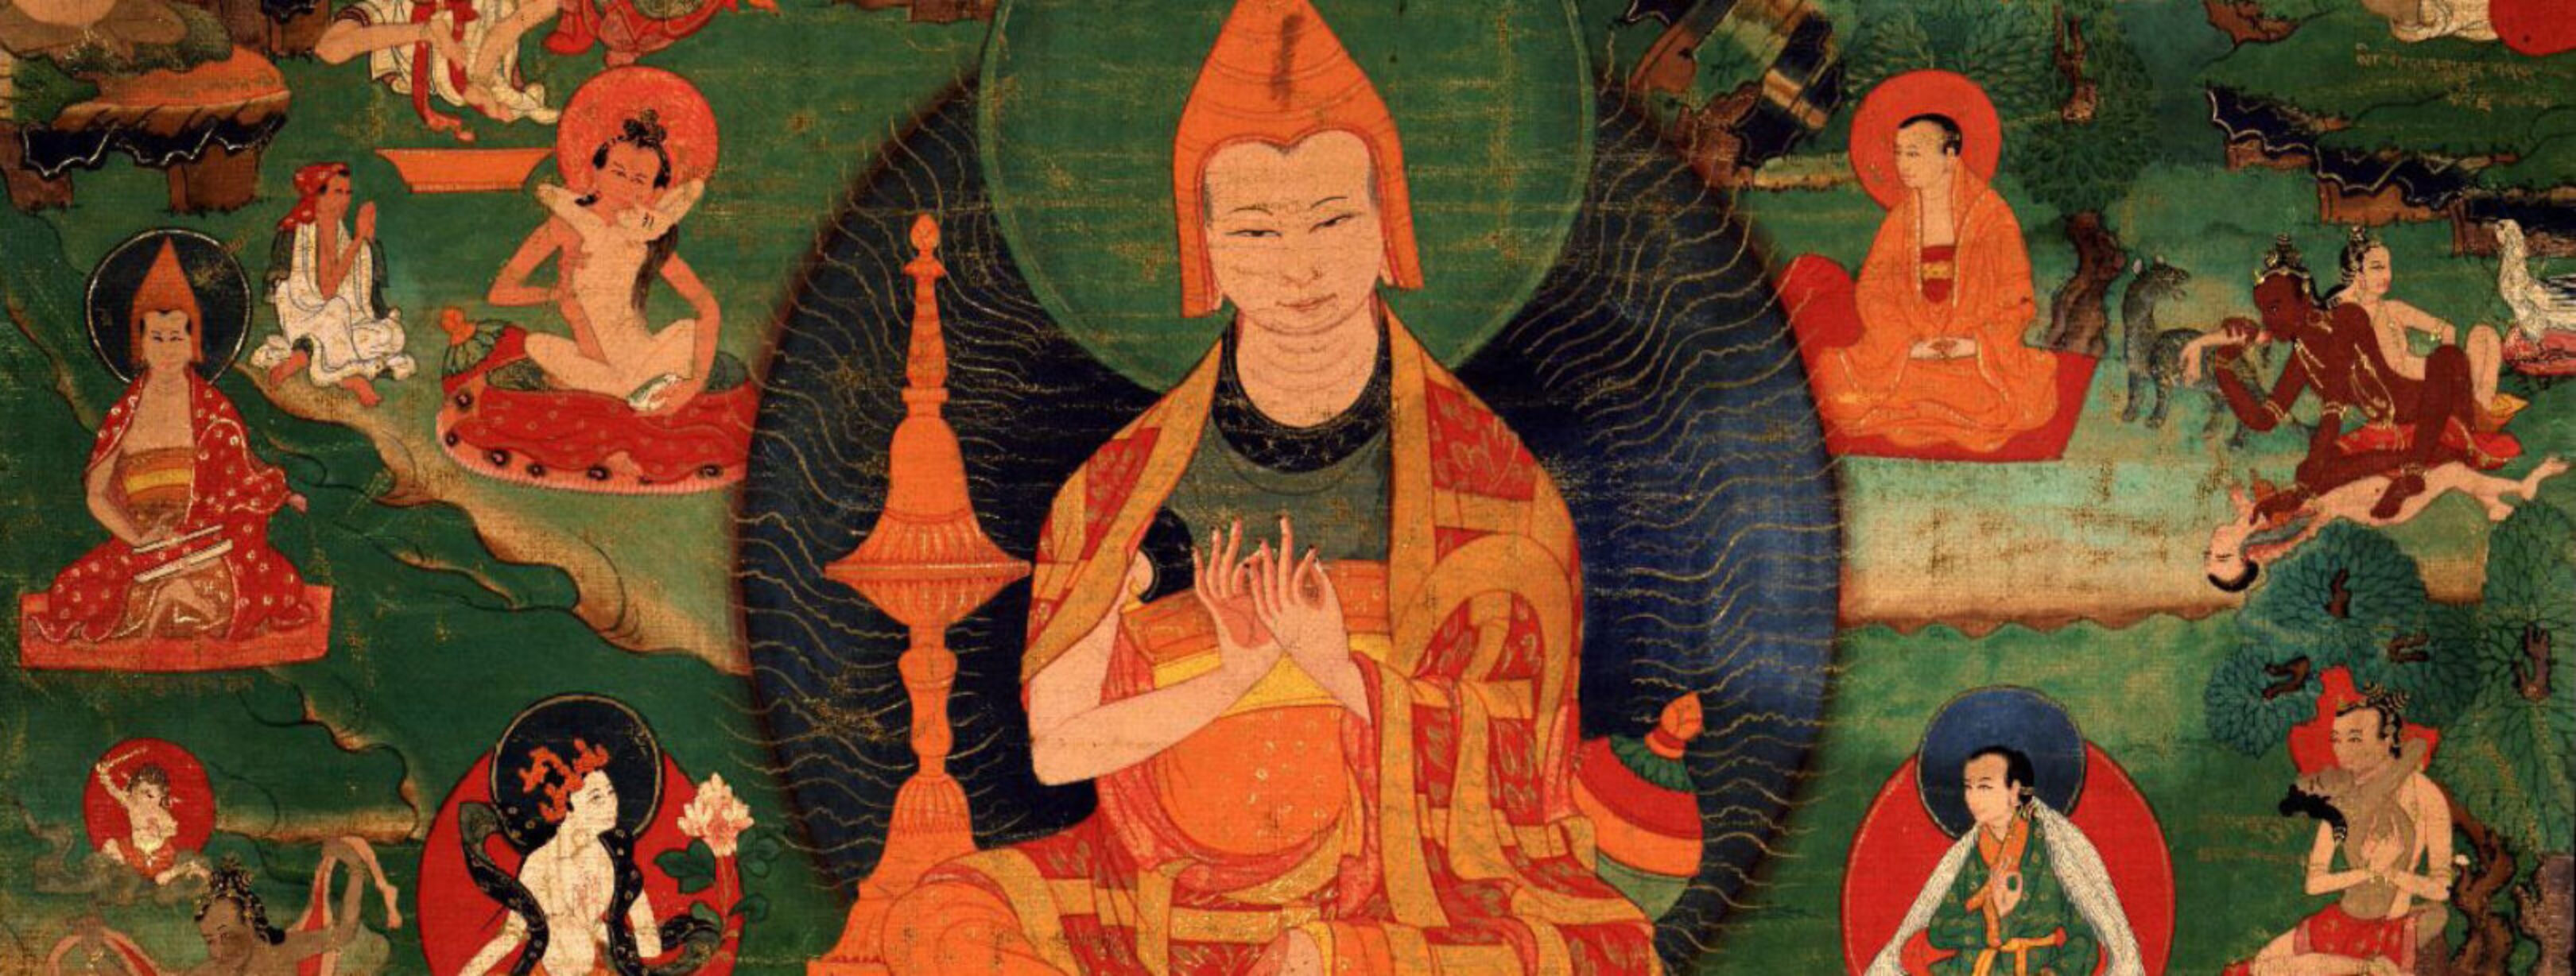 lojong-slogans-boeddhisme